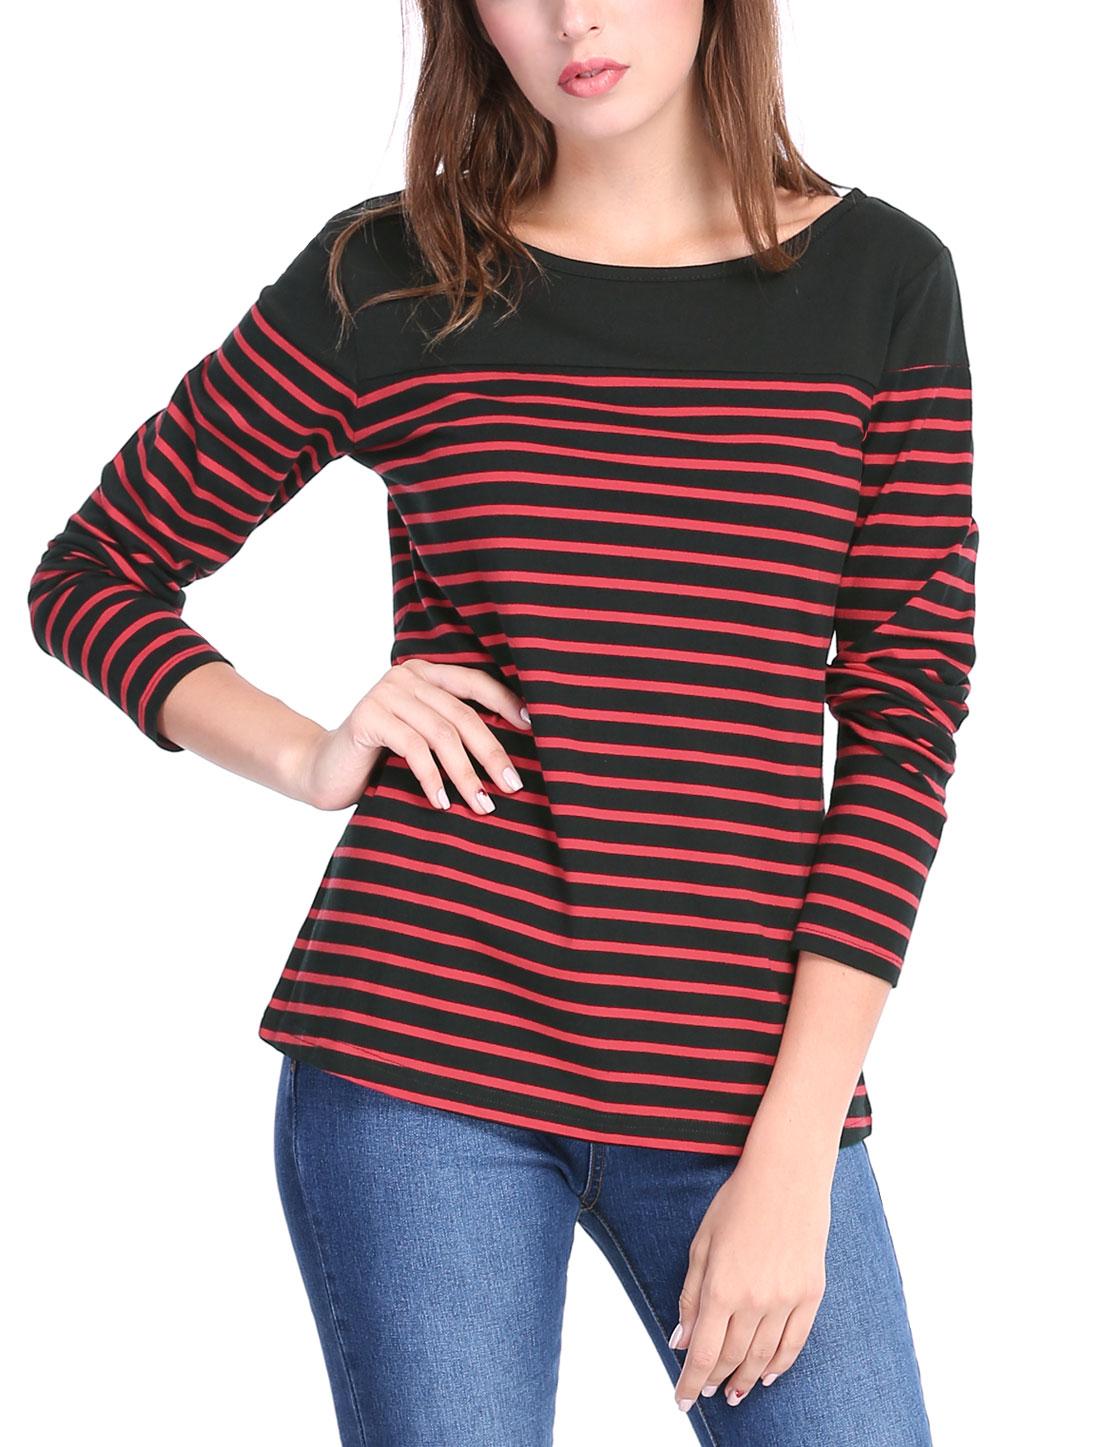 Allegra K Women Classic Striped Long Sleeves Stretch T-Shirt Black Red XL